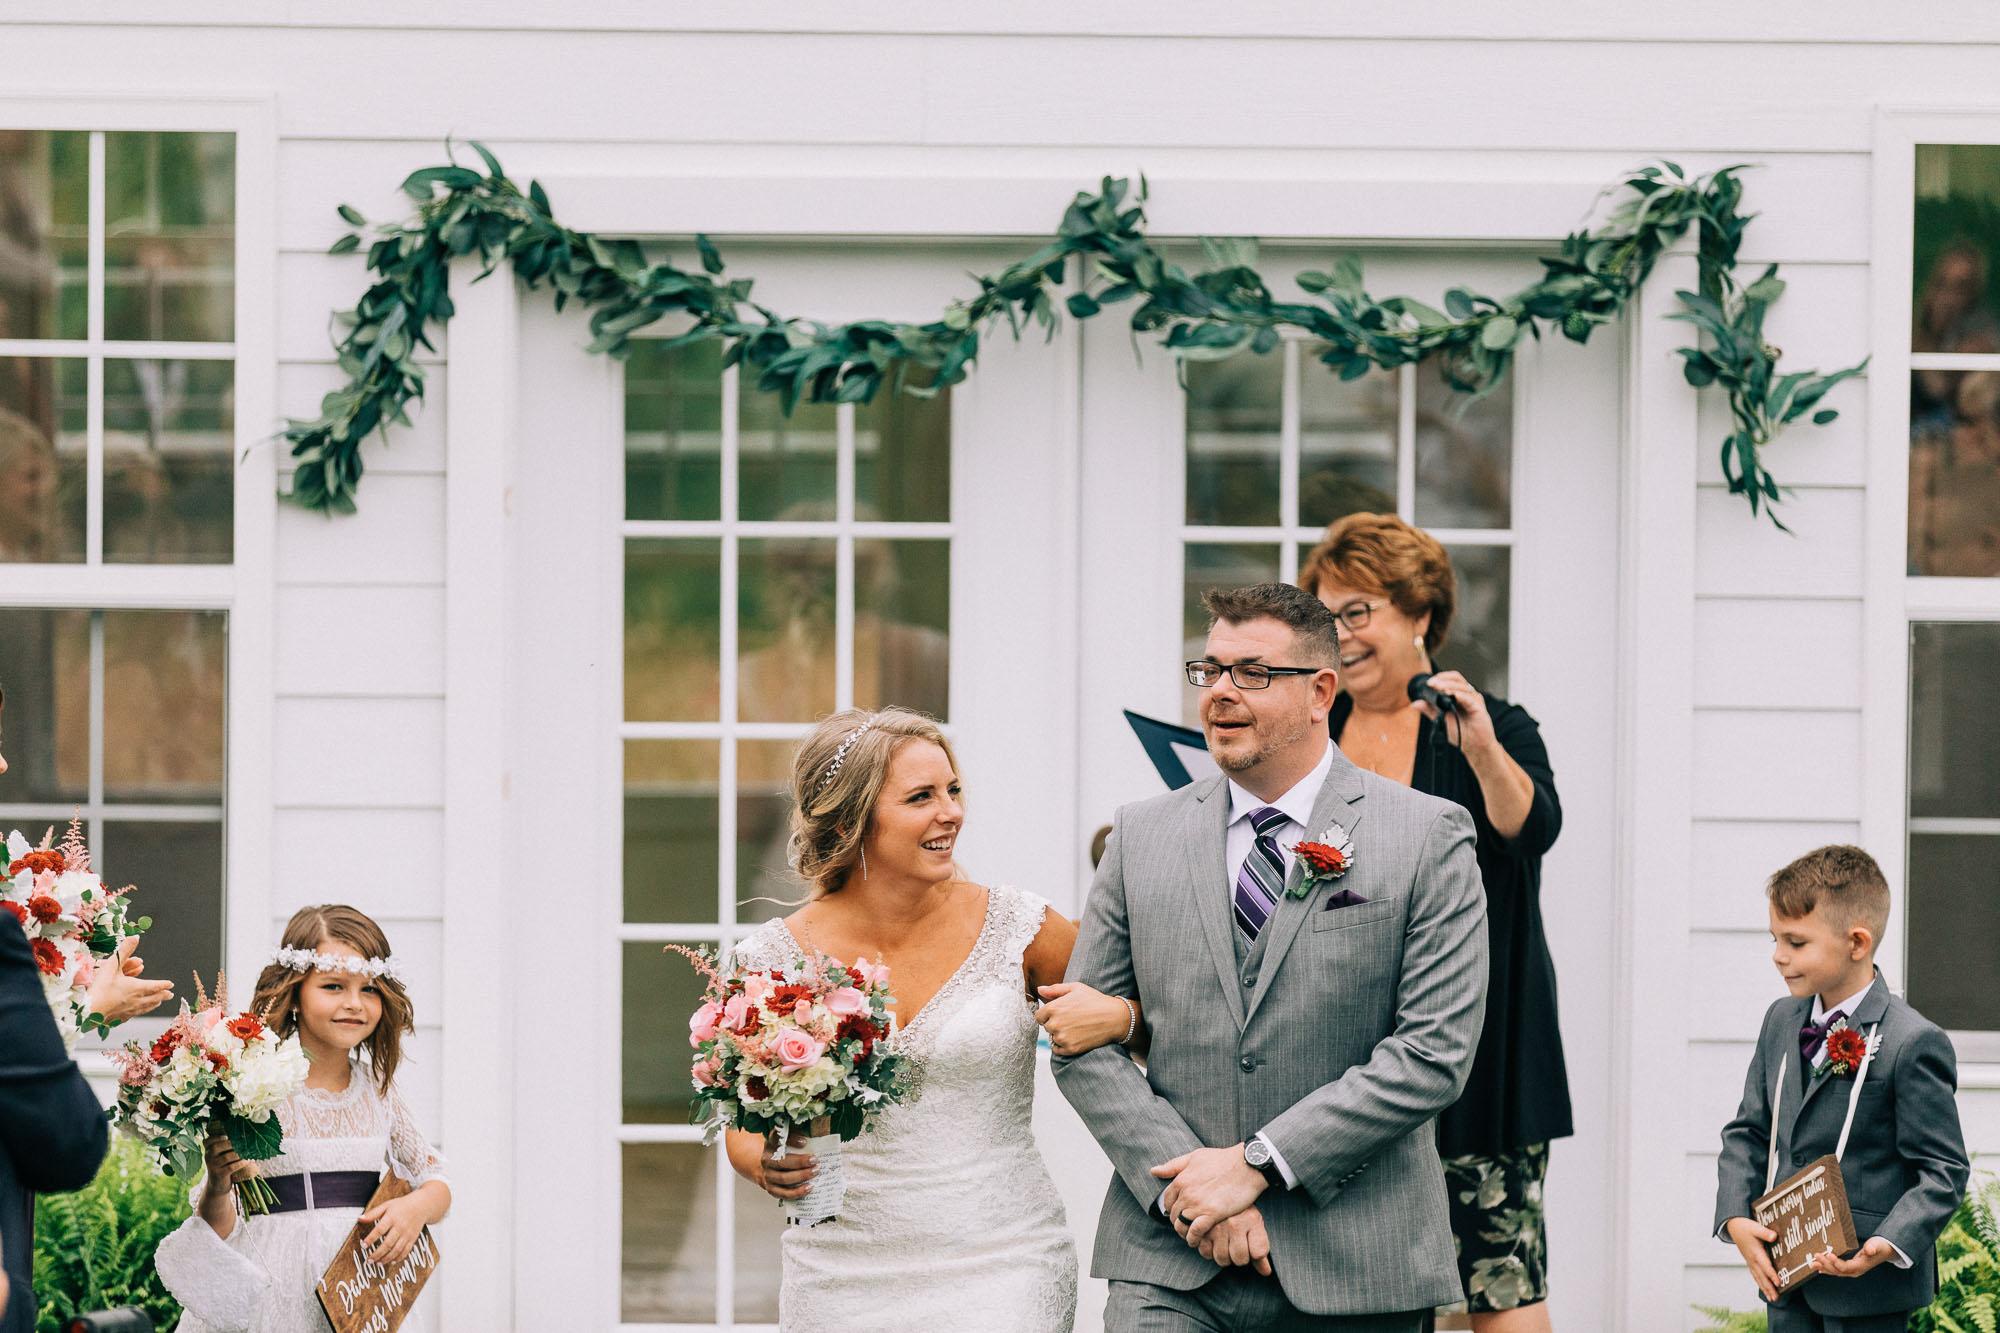 Lodge-at-Raven-Creek-October-wedding-40.jpg